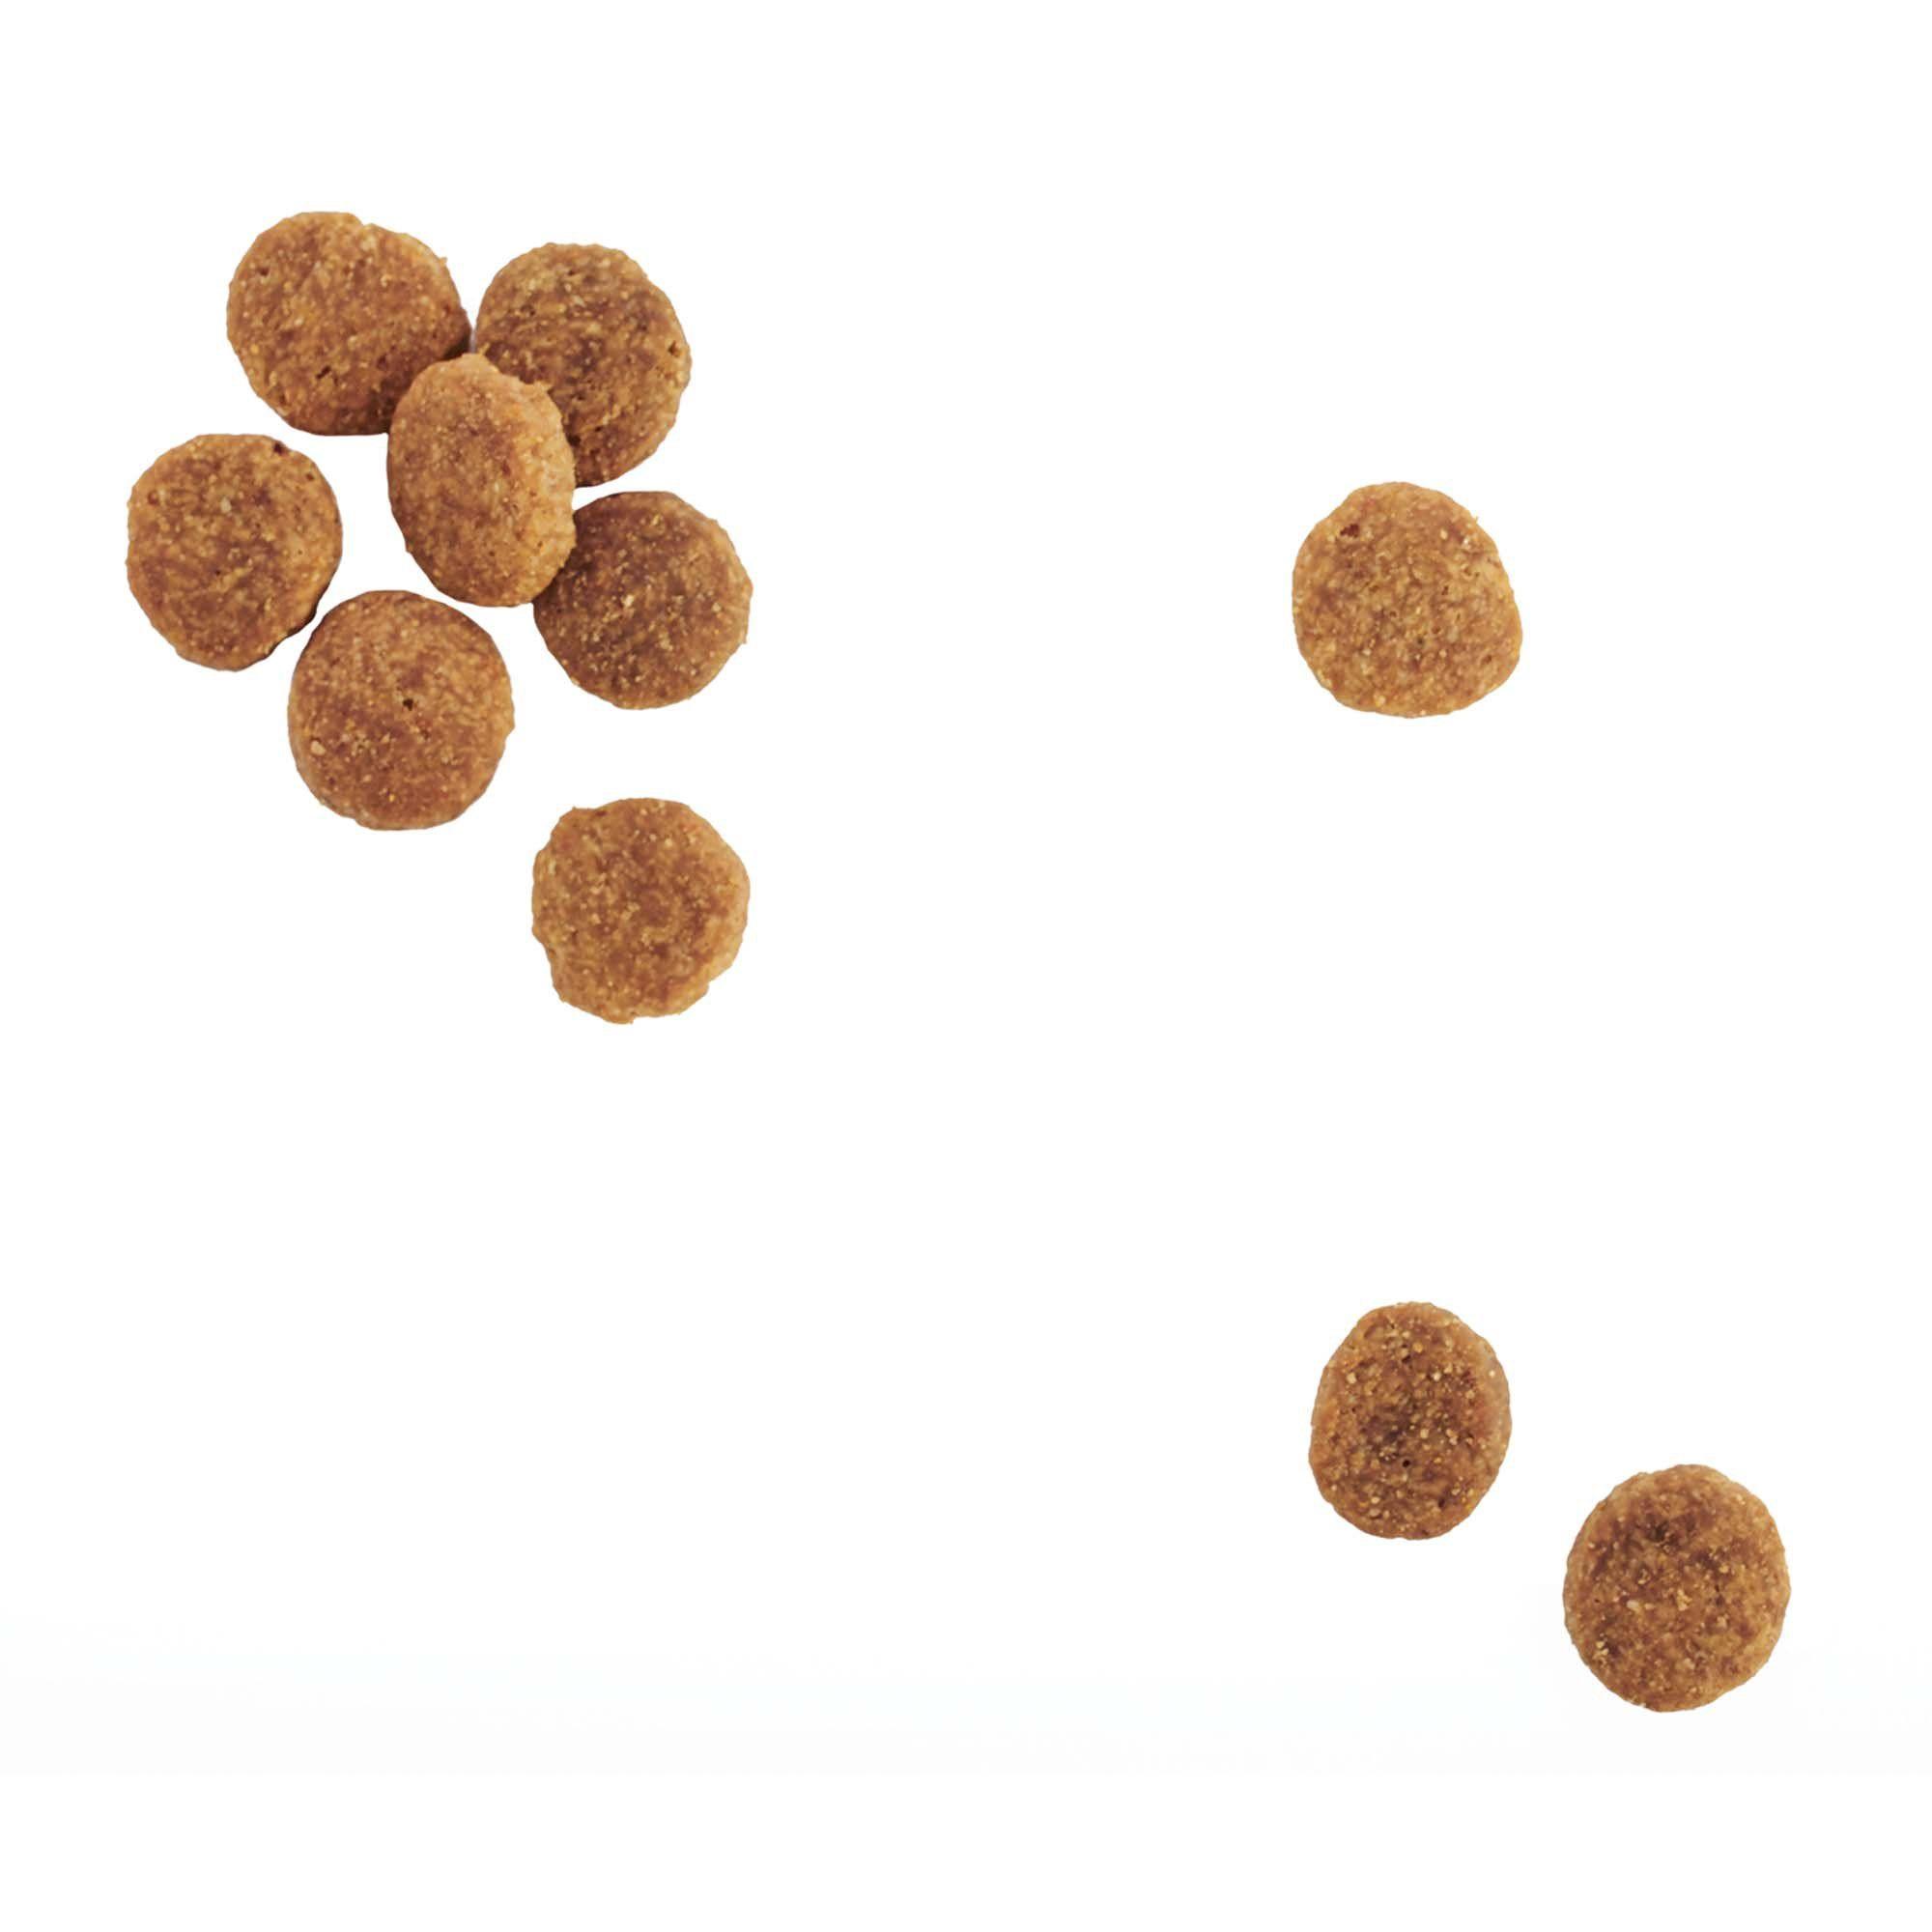 Wholehearted Grain Free Skin And Coat Care Pea And Salmon Recipe Dry Dog Food 5 Lbs Petco Dog Food Recipes Dry Dog Food Salmon Recipes